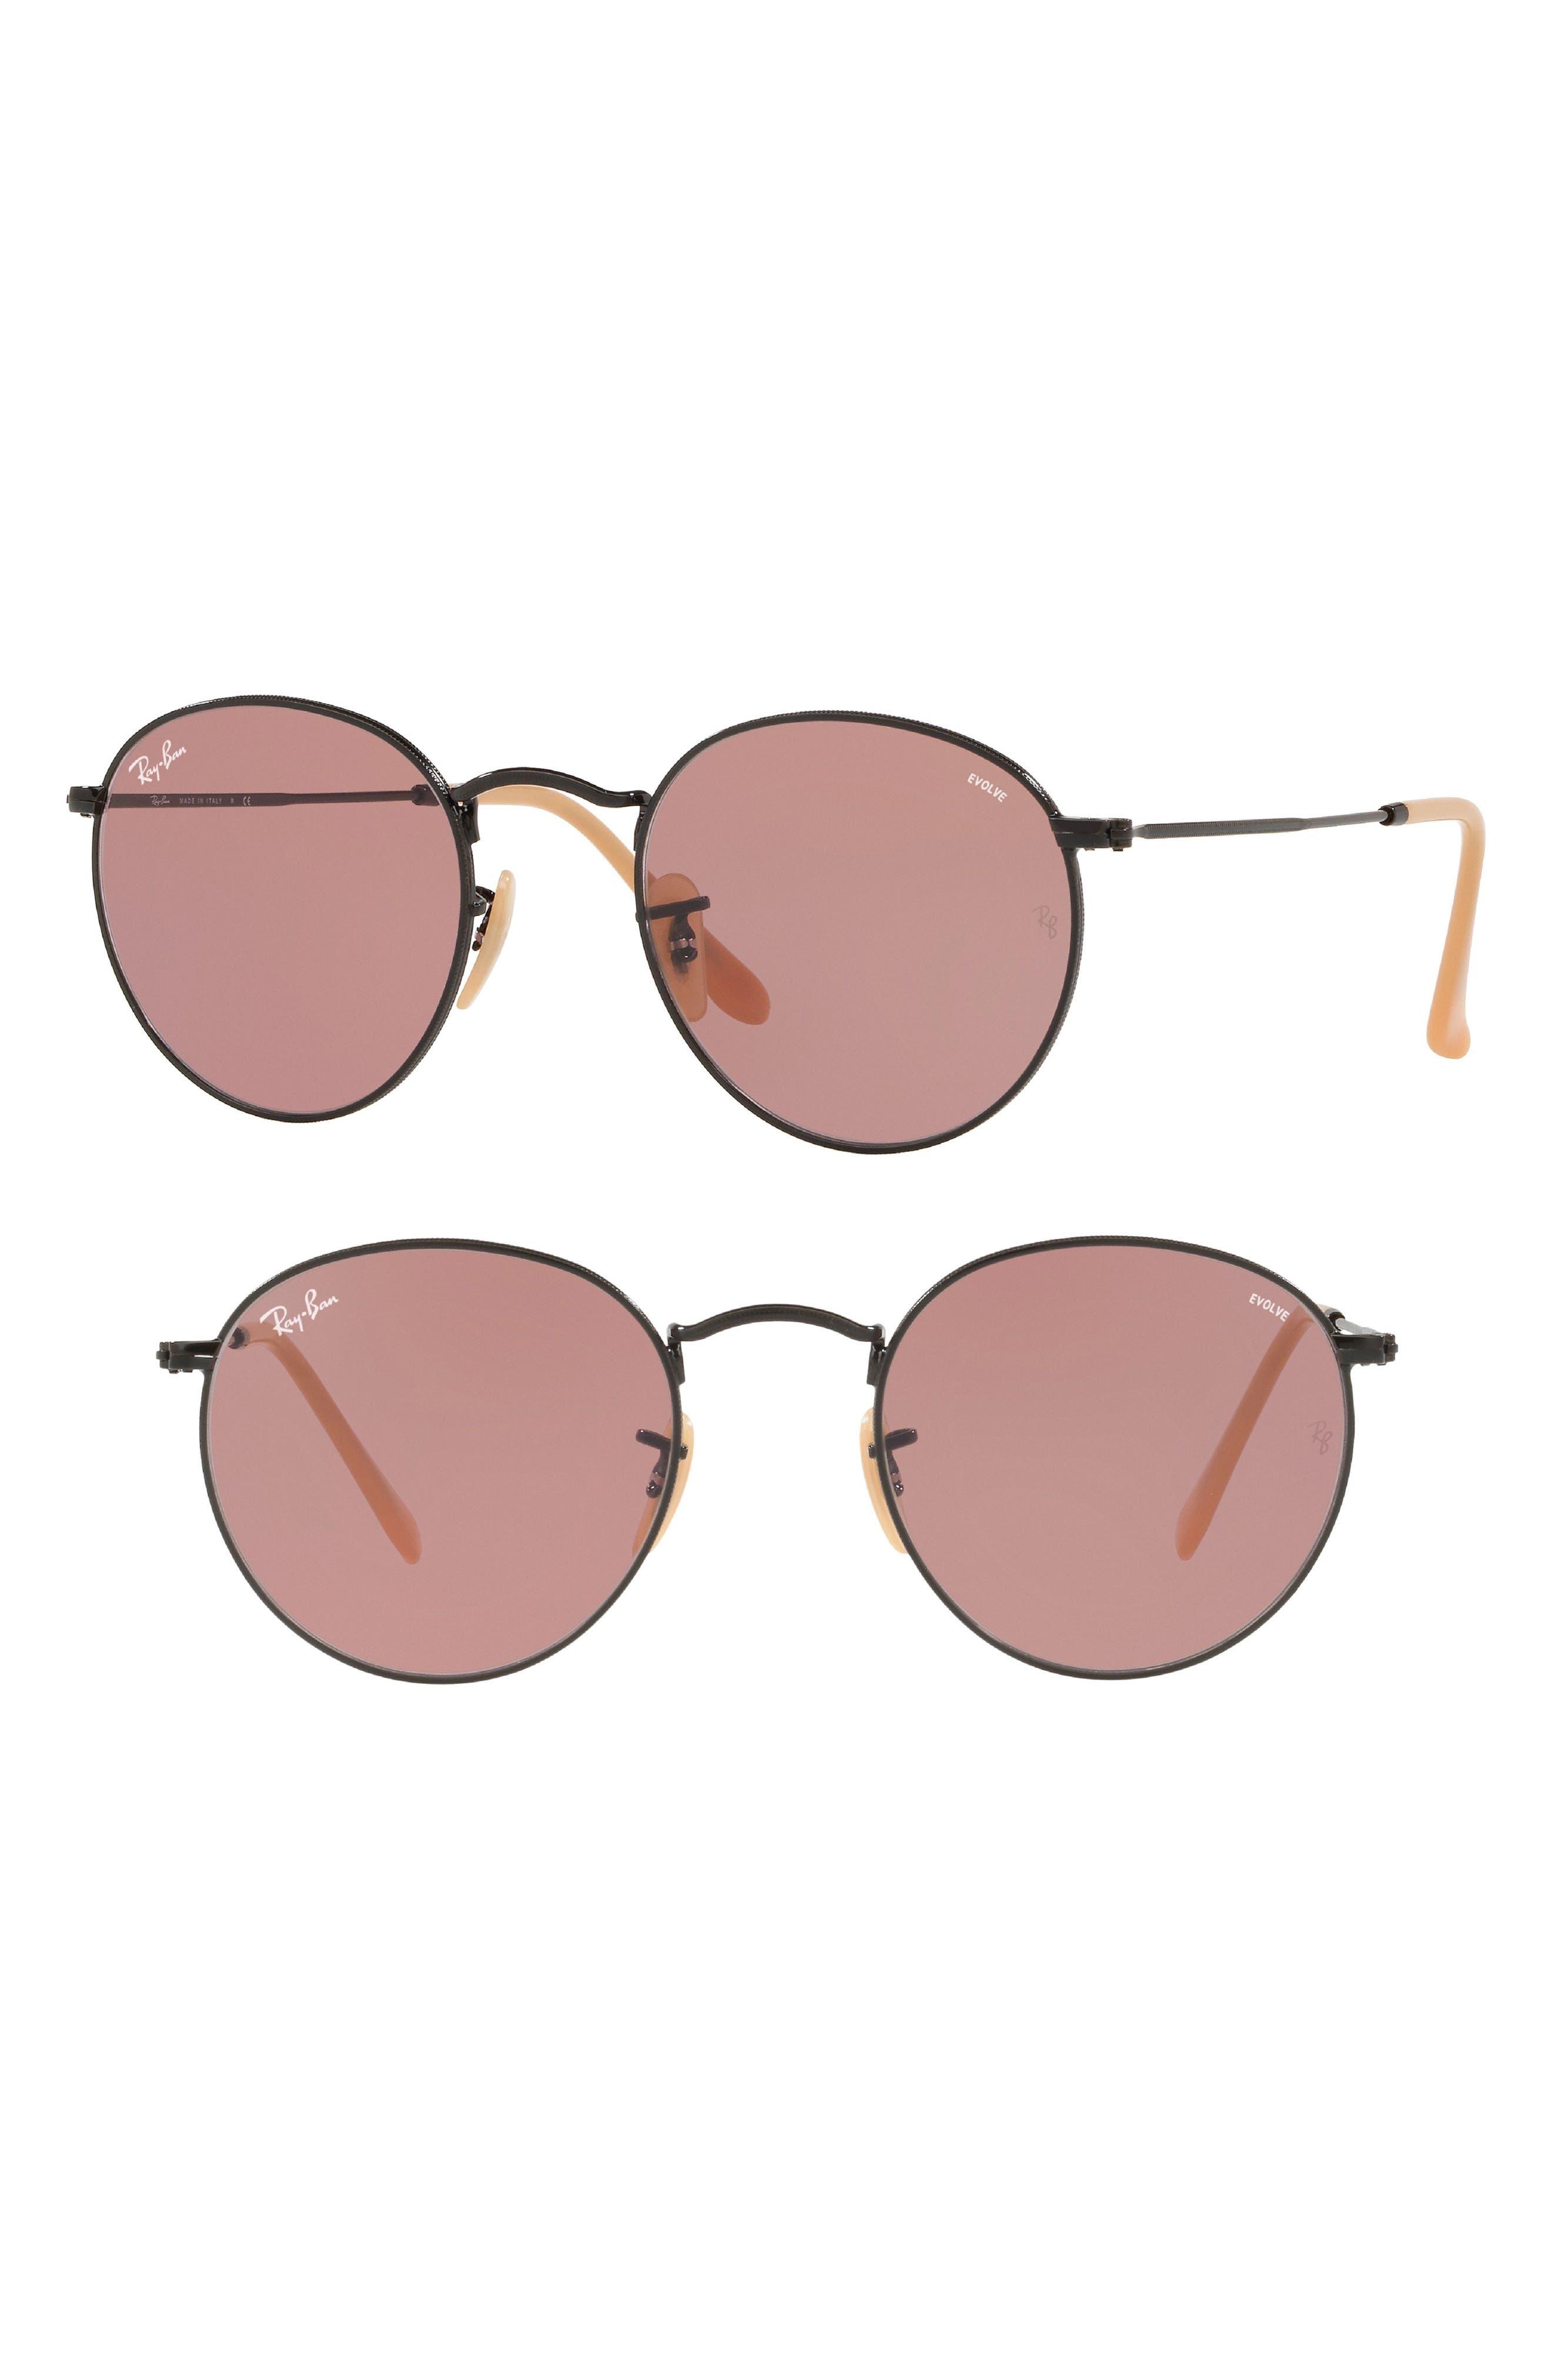 53mm Evolve Photochromic Round Sunglasses,                             Main thumbnail 1, color,                             001